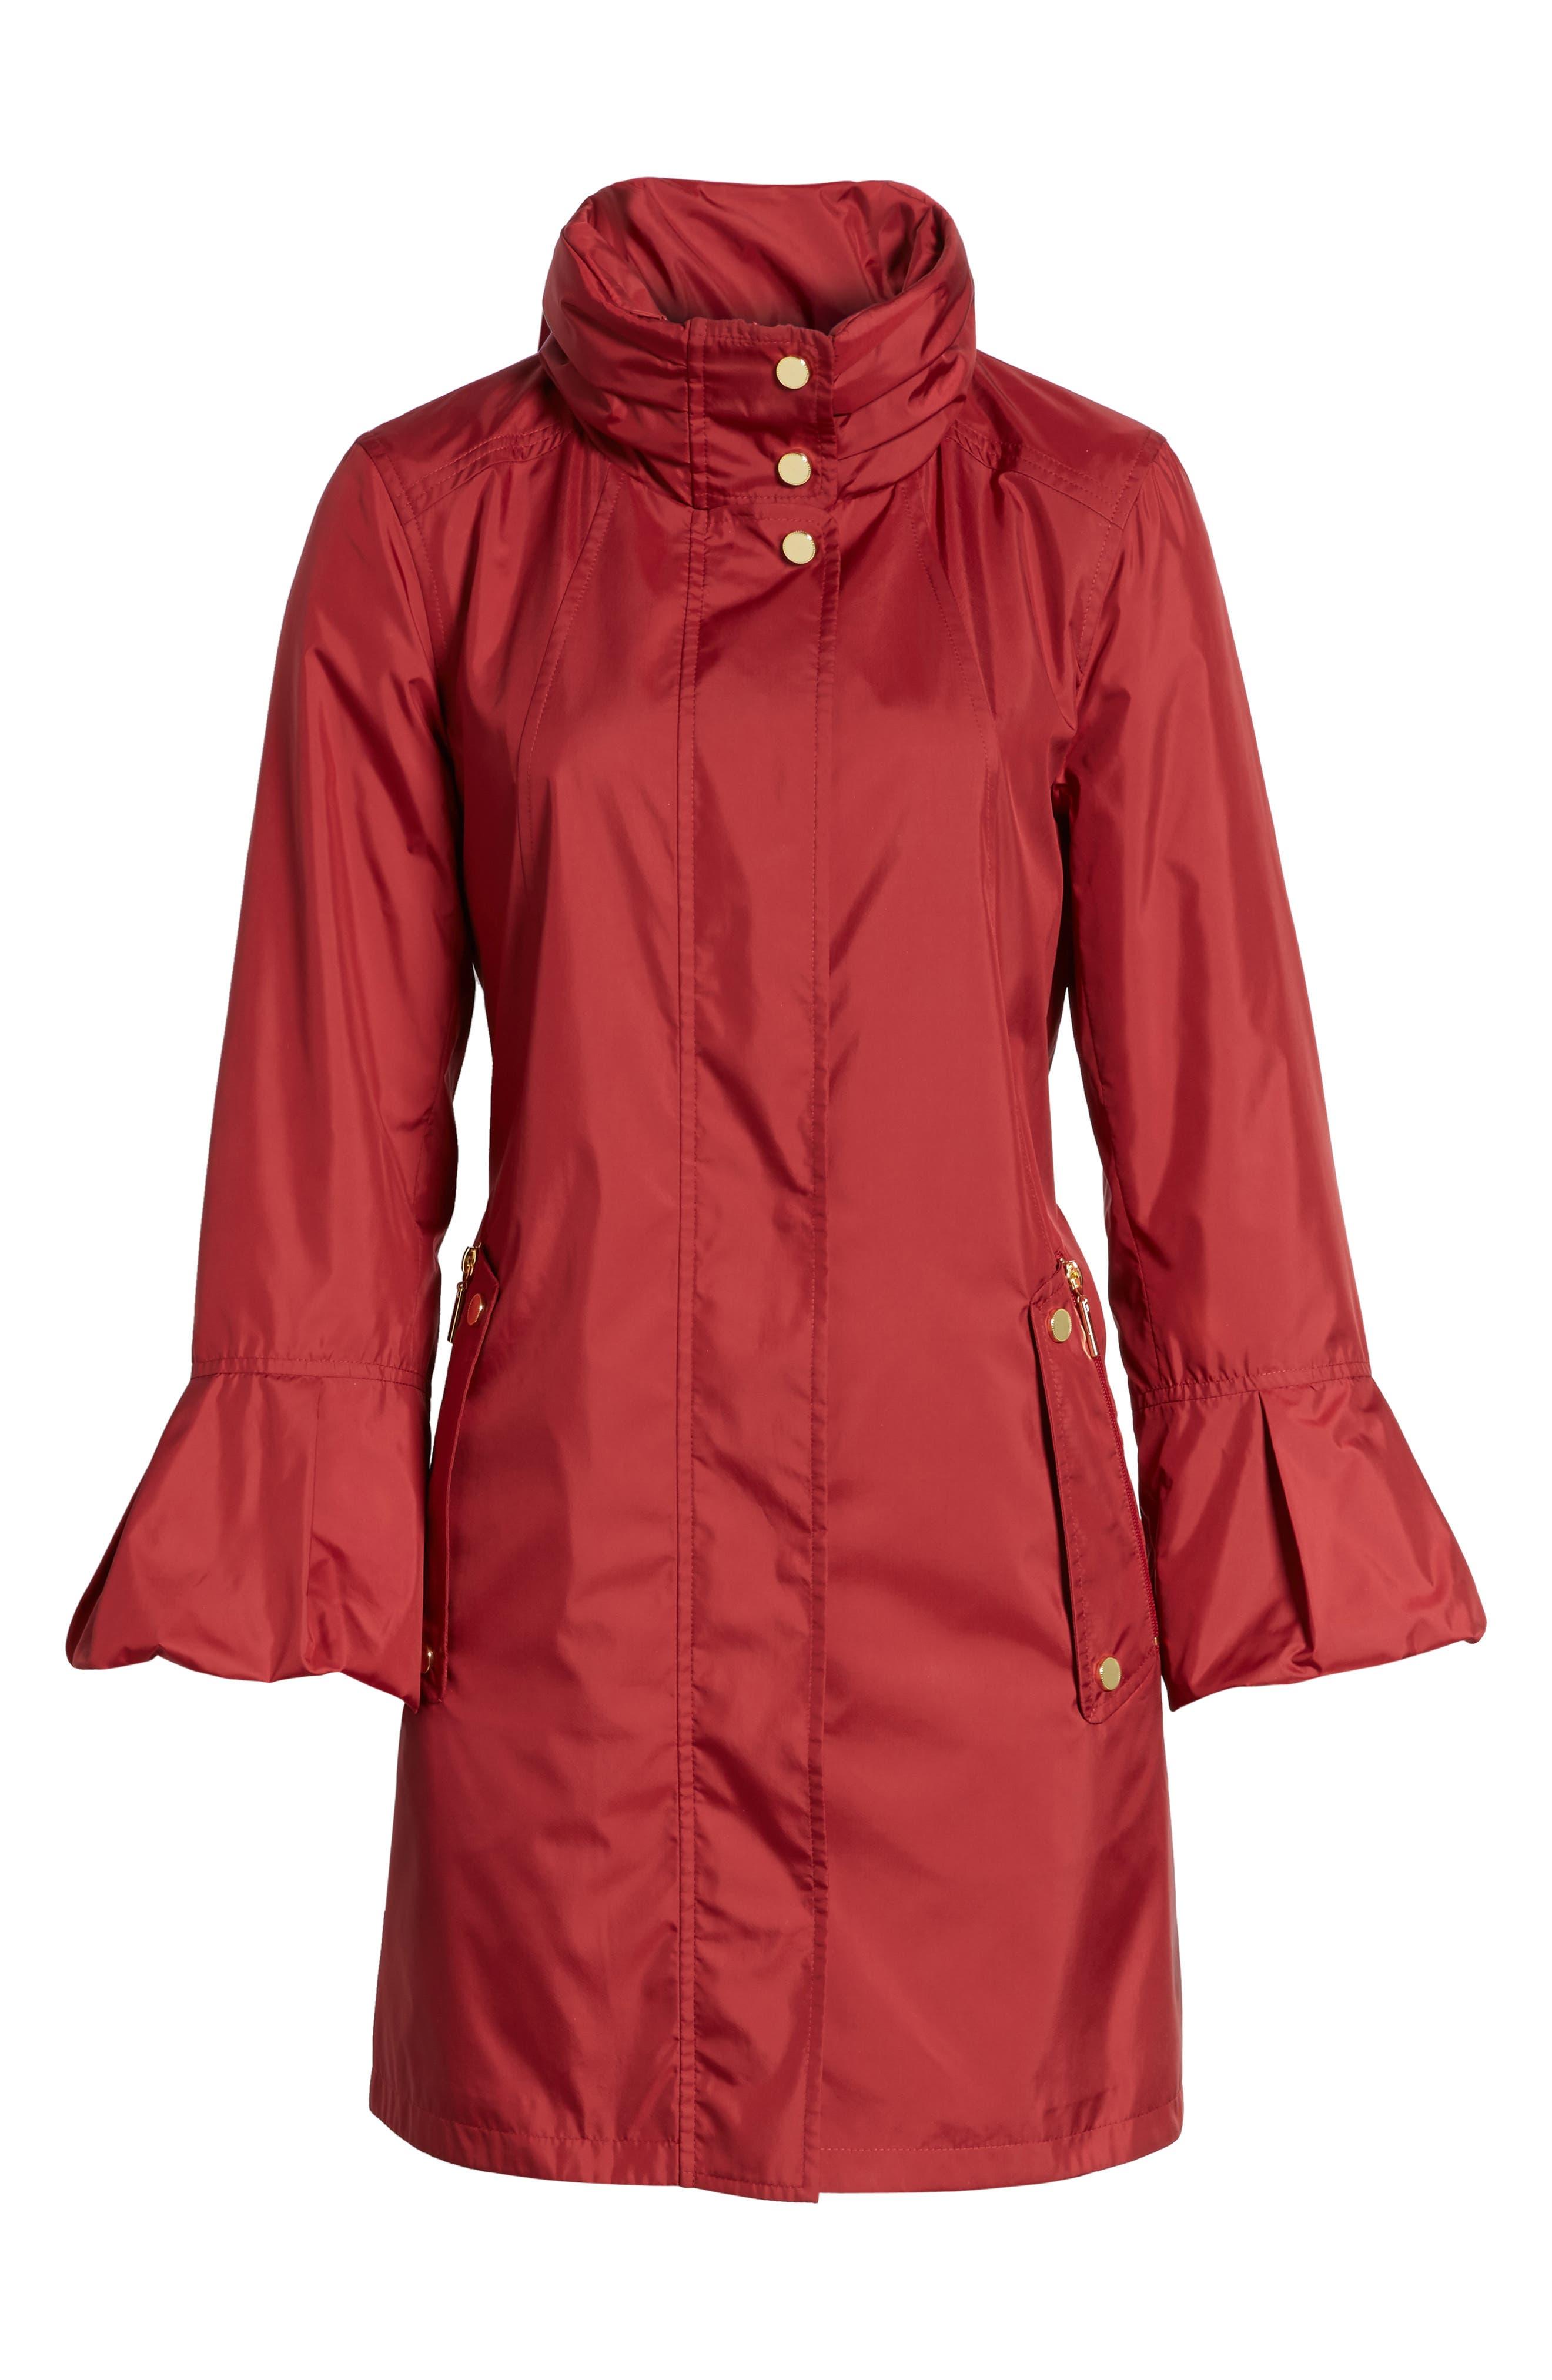 Flare Sleeve Packable Swing Jacket,                             Alternate thumbnail 6, color,                             Garnet